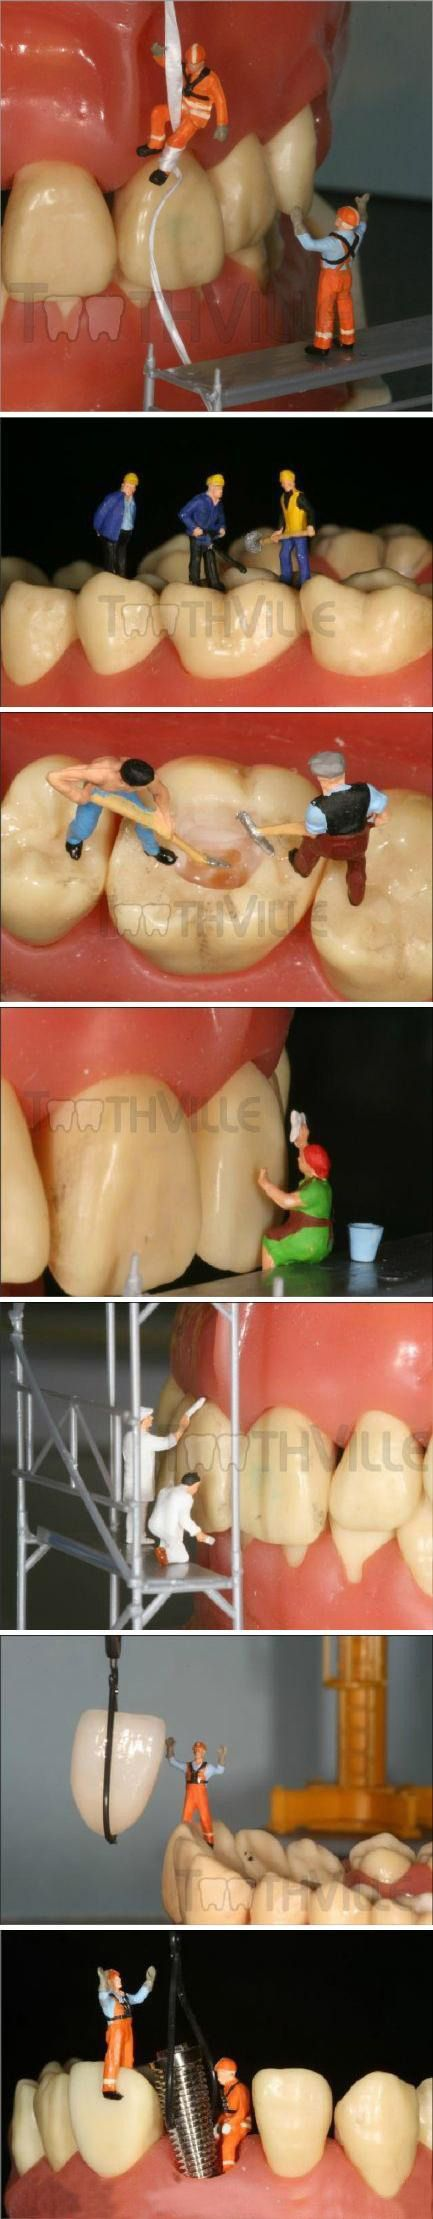 Tooth work #dentistry #GRANDDENTAL